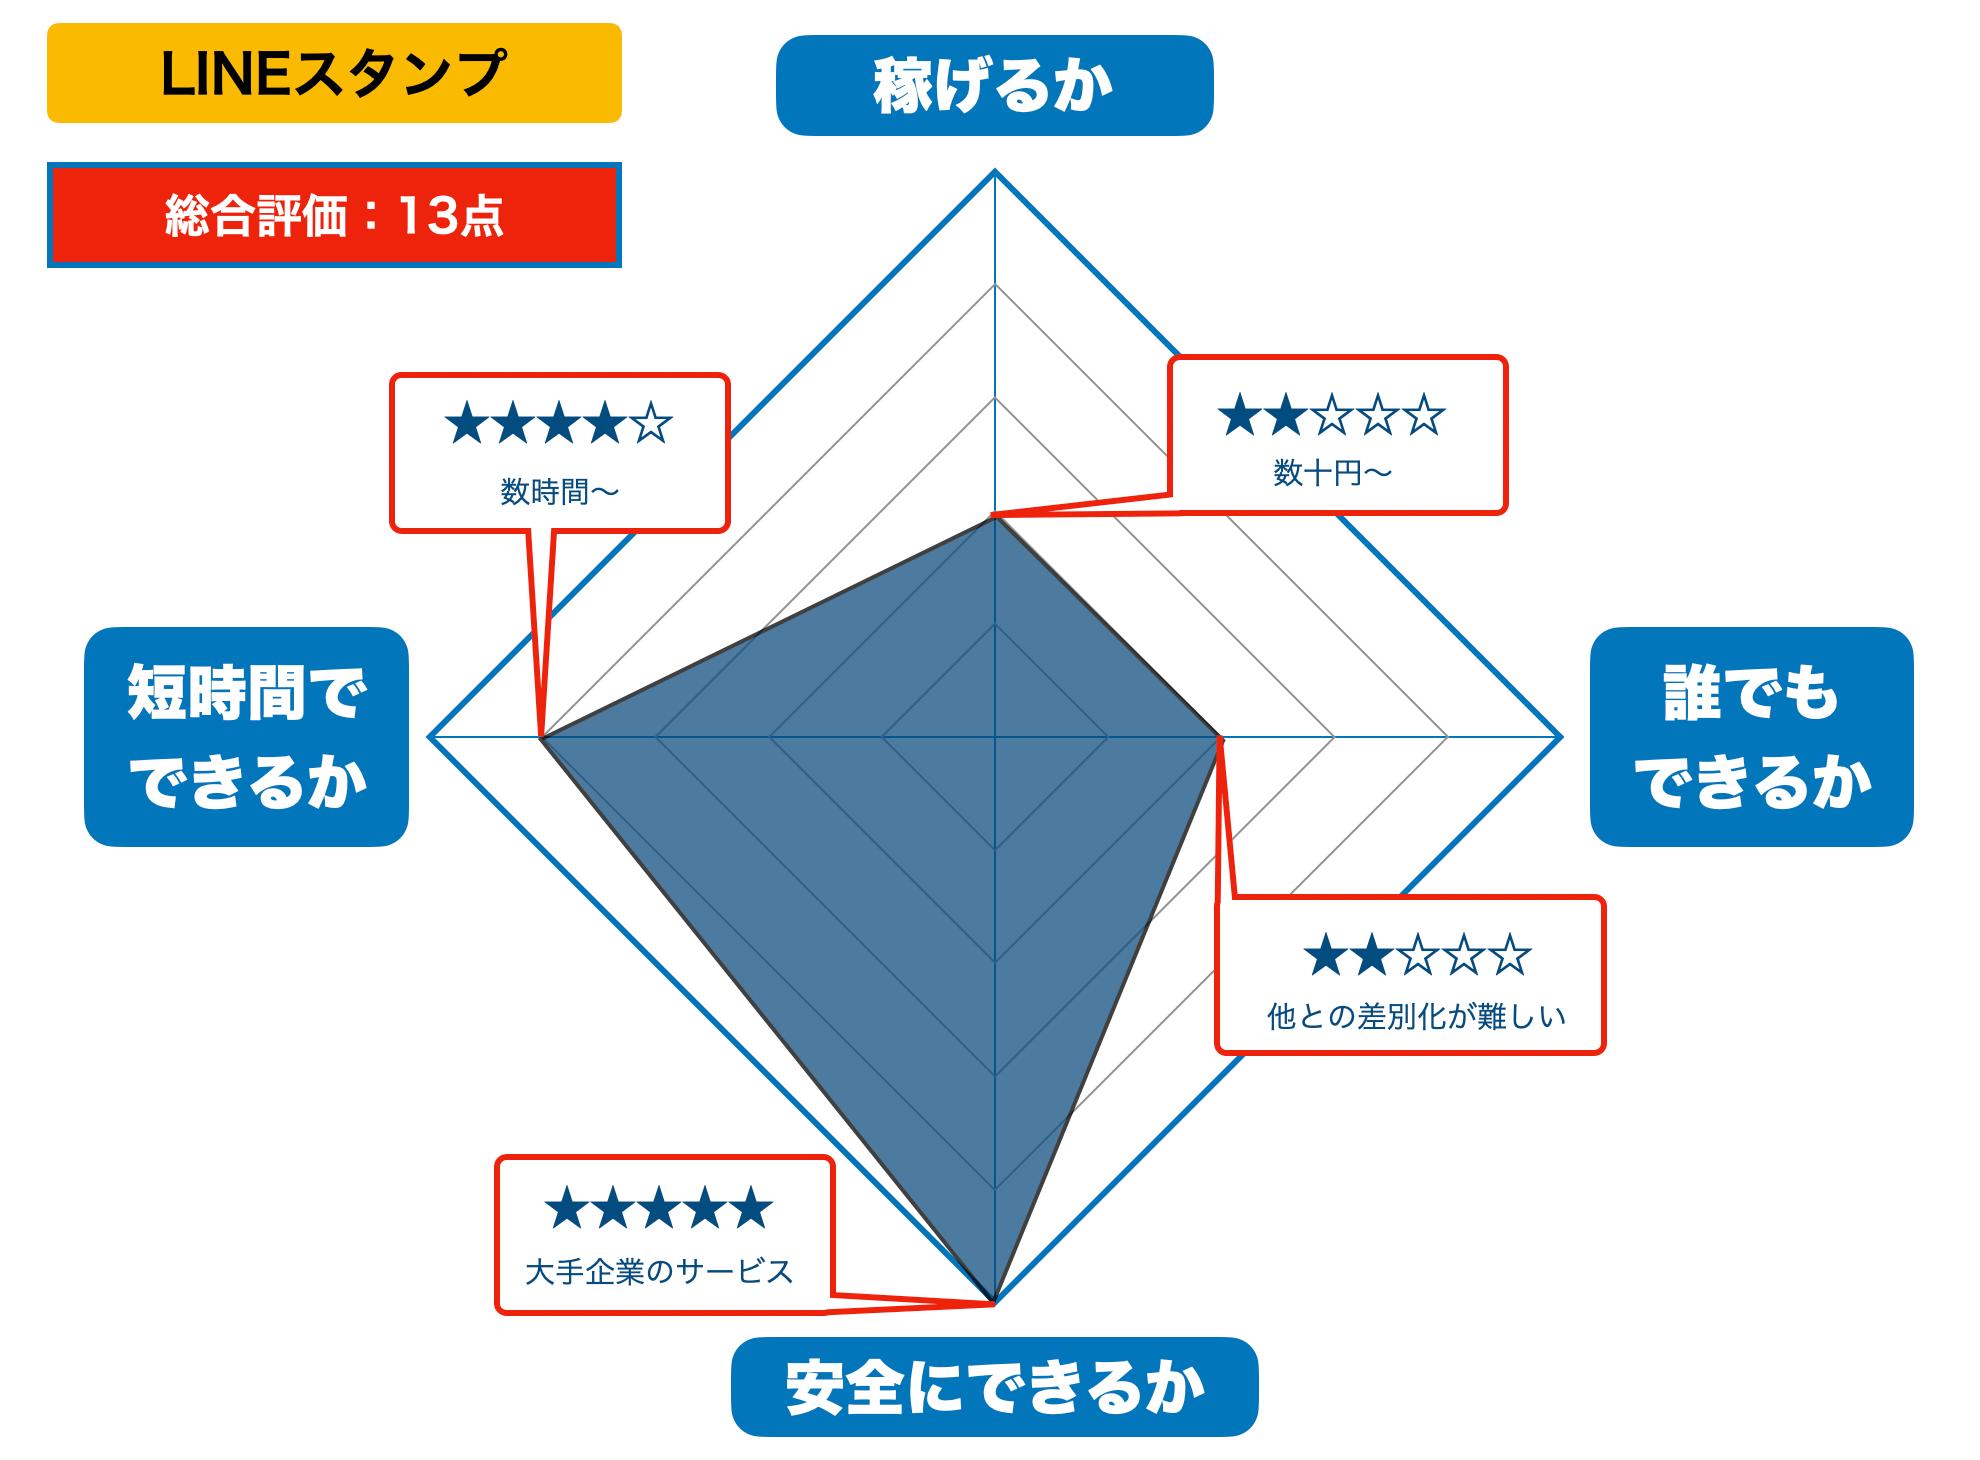 LINEスタンプの評価(2021年版)